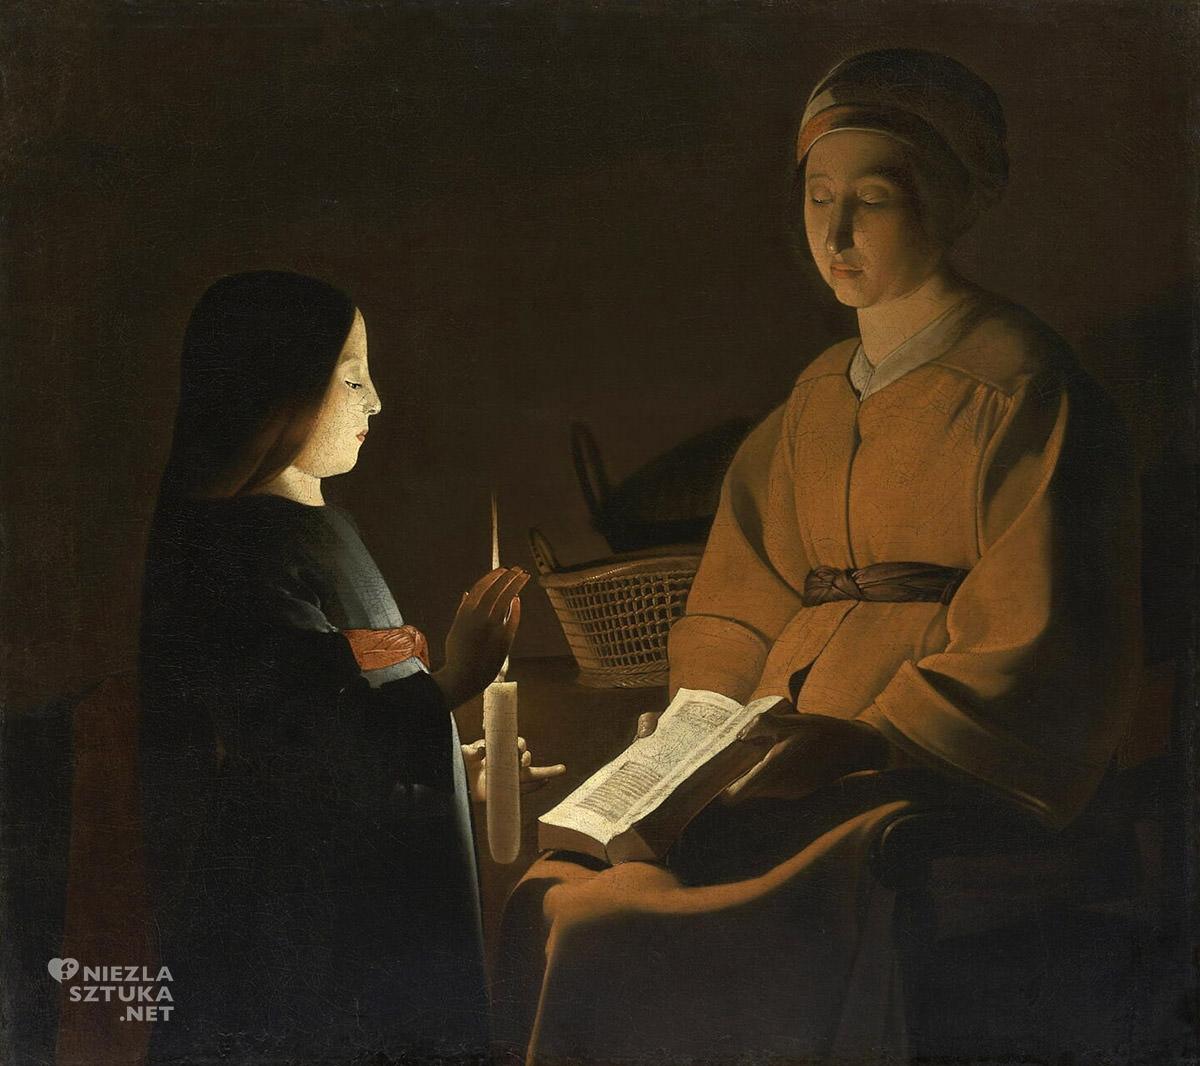 Georges de La Tour, Edukacja dziewicy, barok sztuka francuska, Luwr, Niezła Sztuka